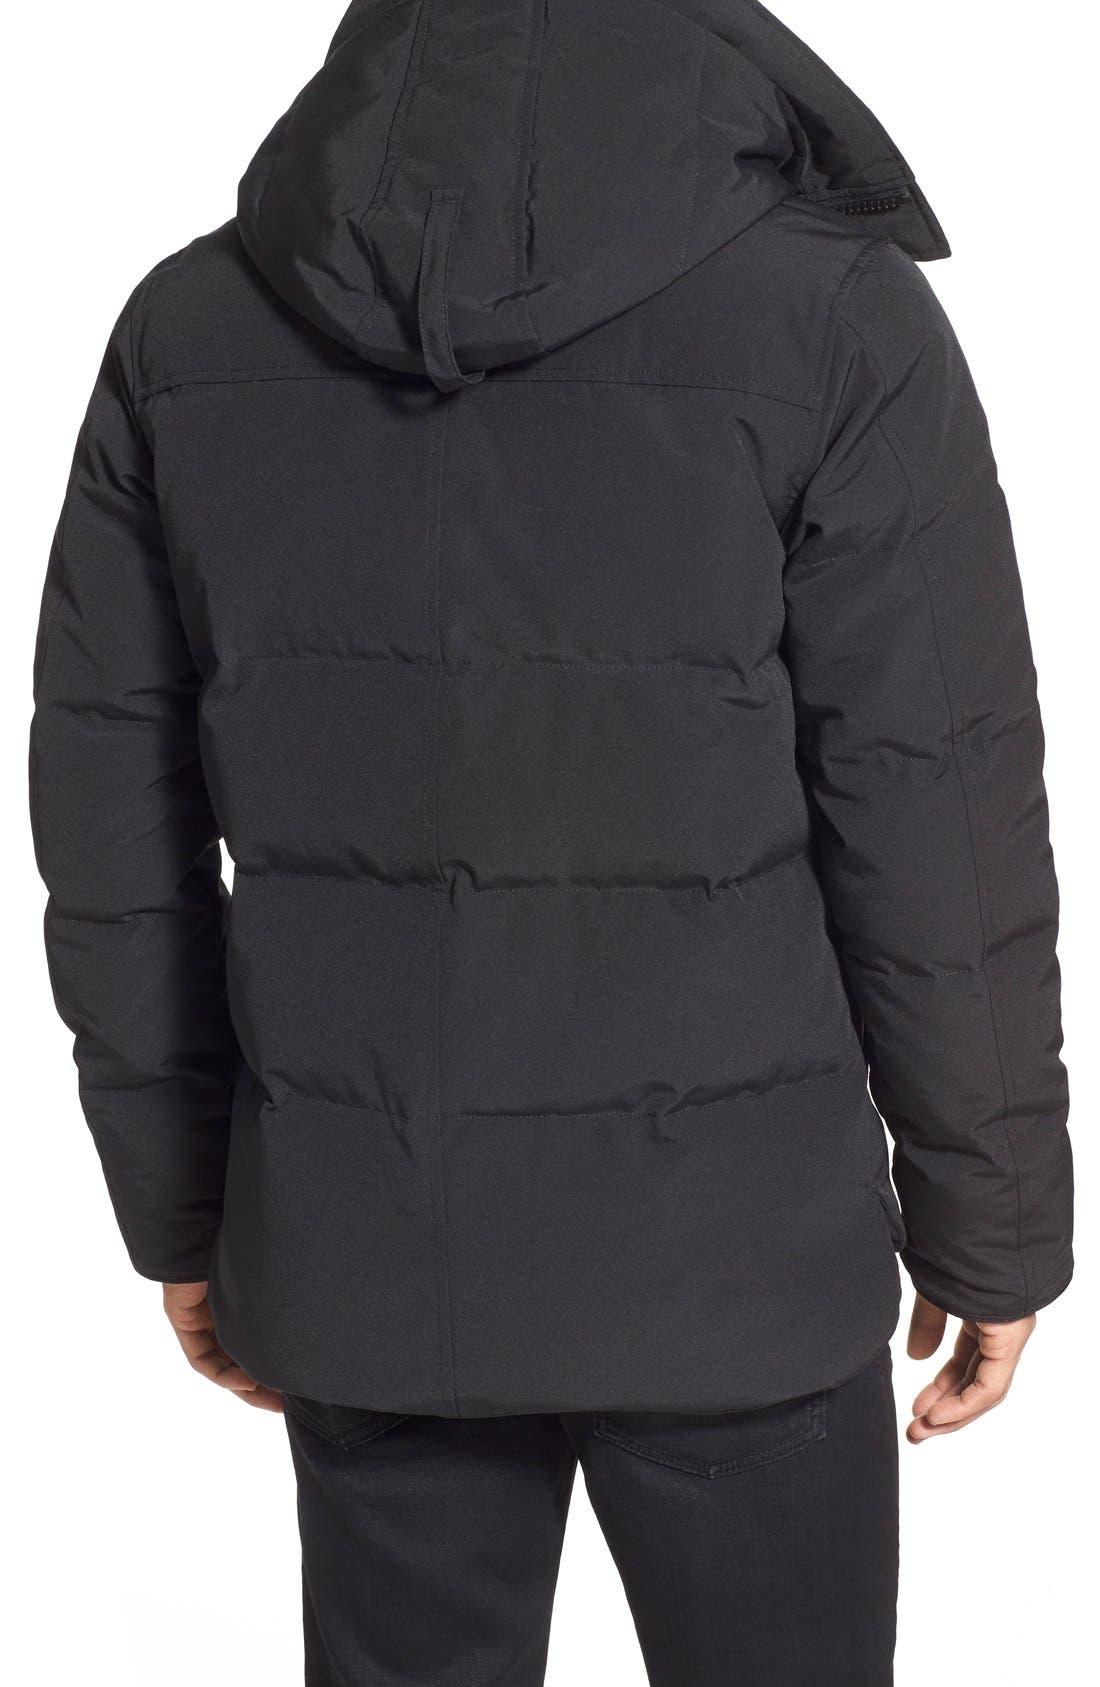 'MacMillan' Slim Fit Hooded Parka,                             Alternate thumbnail 3, color,                             BLACK